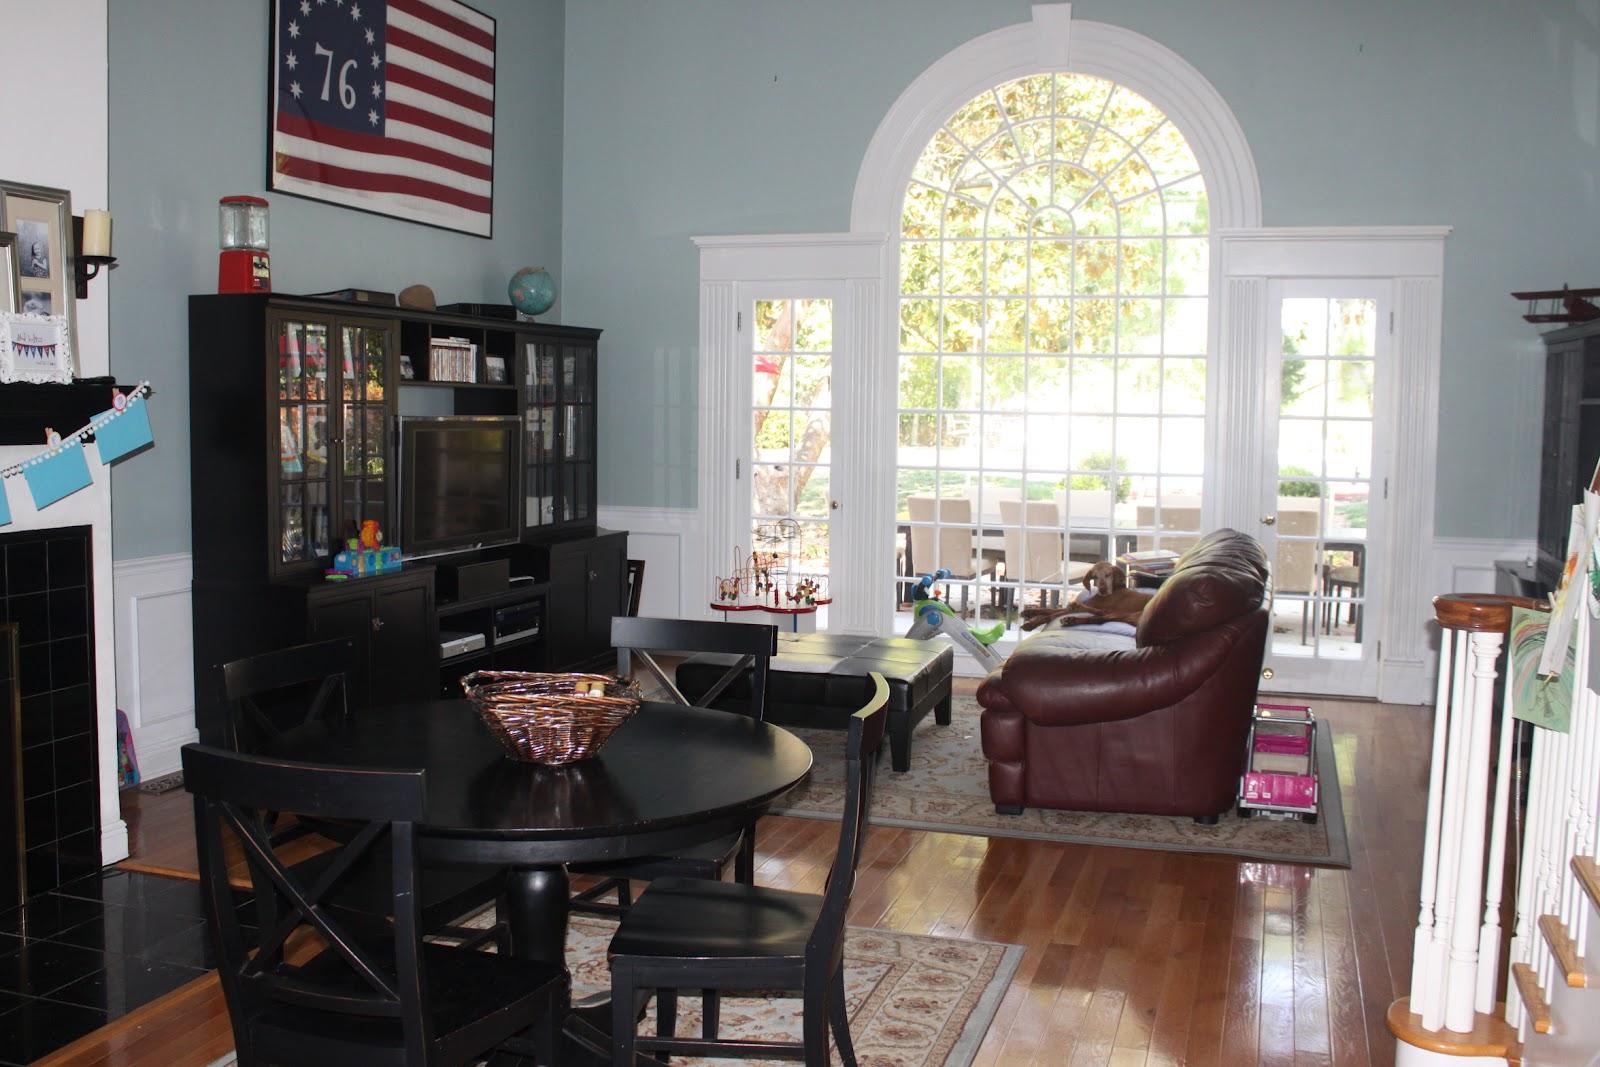 haleyv6: The Living Room